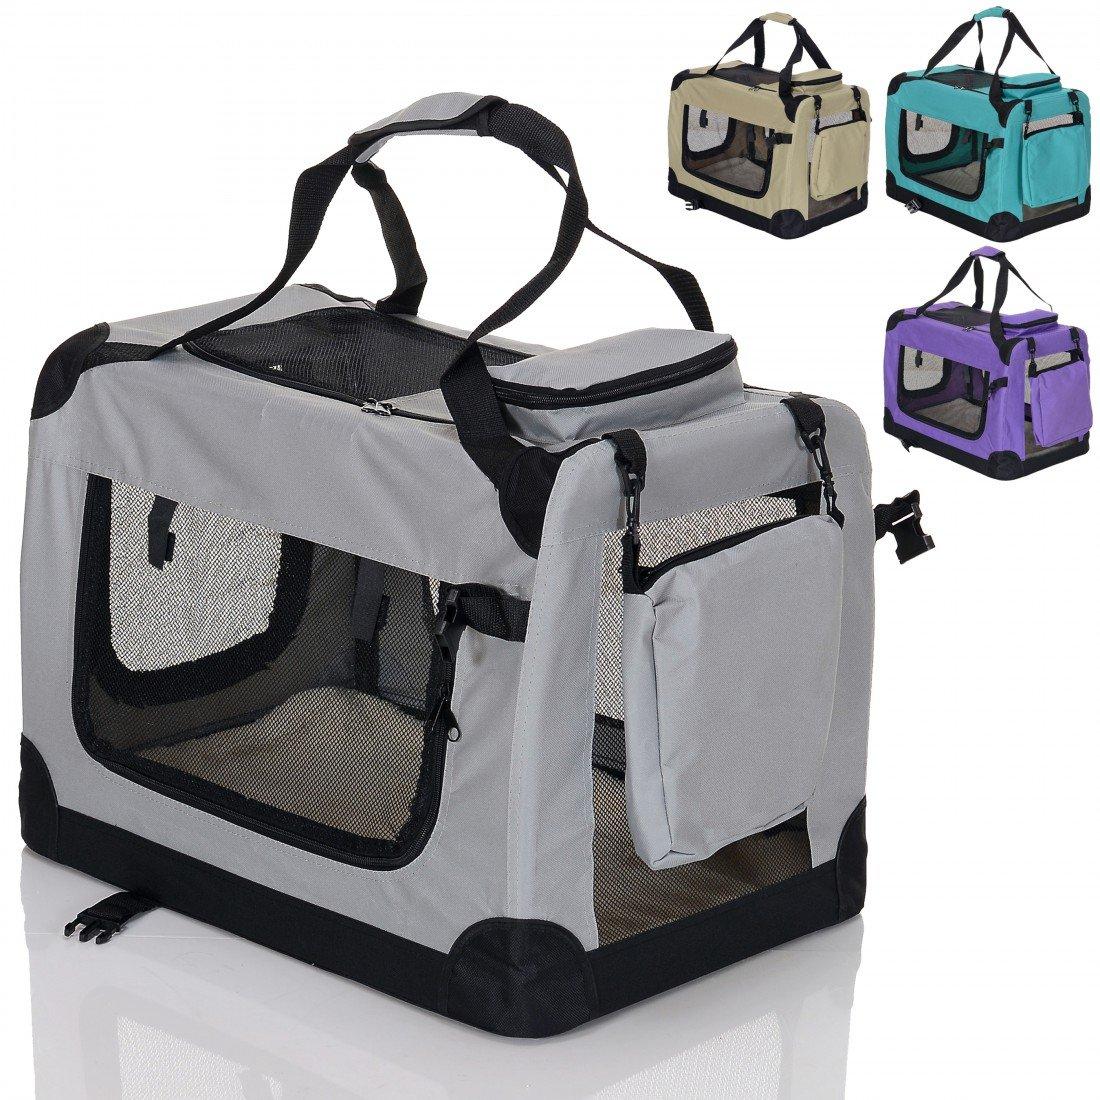 faltbare Hundebox Haustier Transportbox klappbare Autobox 82x60x60 cm gepolstert Katzen Henkel Tragetasche